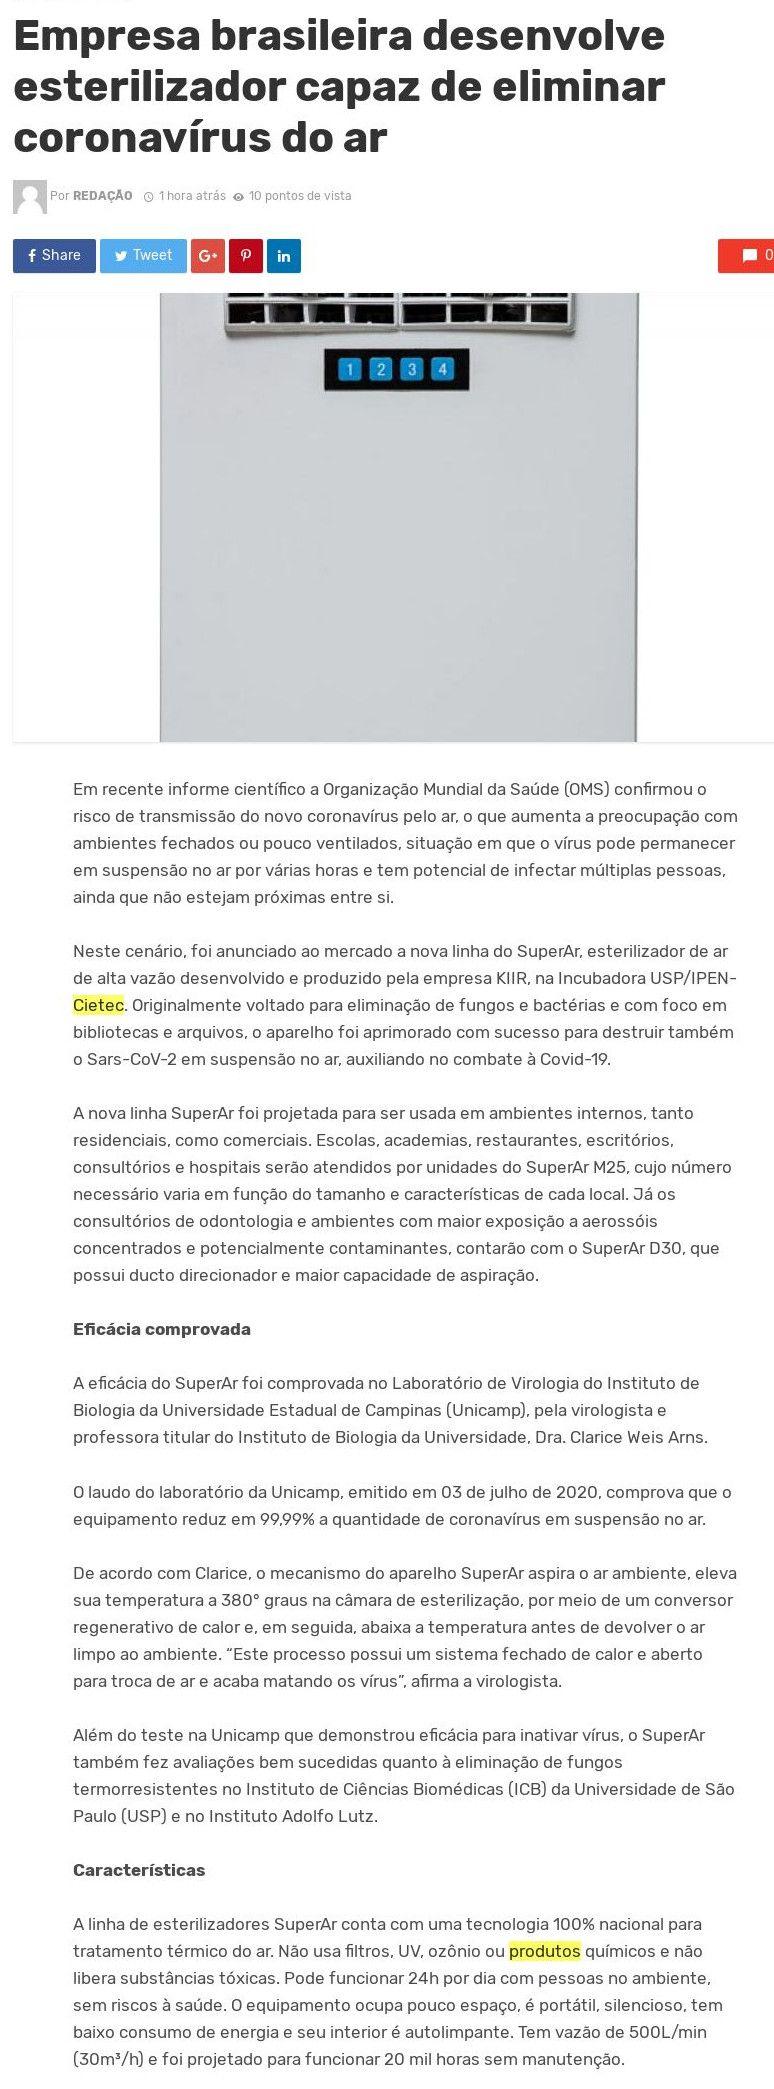 Empresa brasileira desenvolve esterilizador capaz de eliminar coronavírus do ar - Saúde Digital News